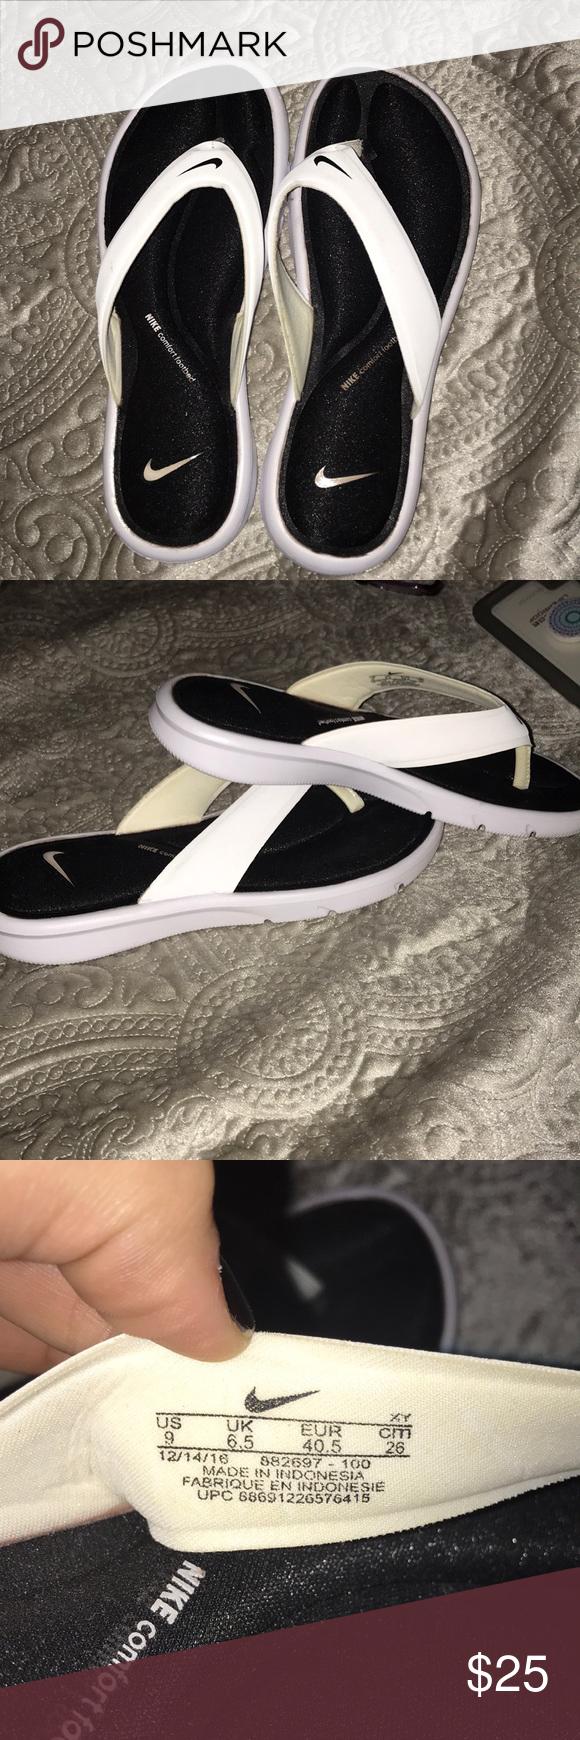 Escribe un reporte evitar resistirse  Nike comfort footbed flip flops | Black and white nikes, Black nikes, Flip  flops